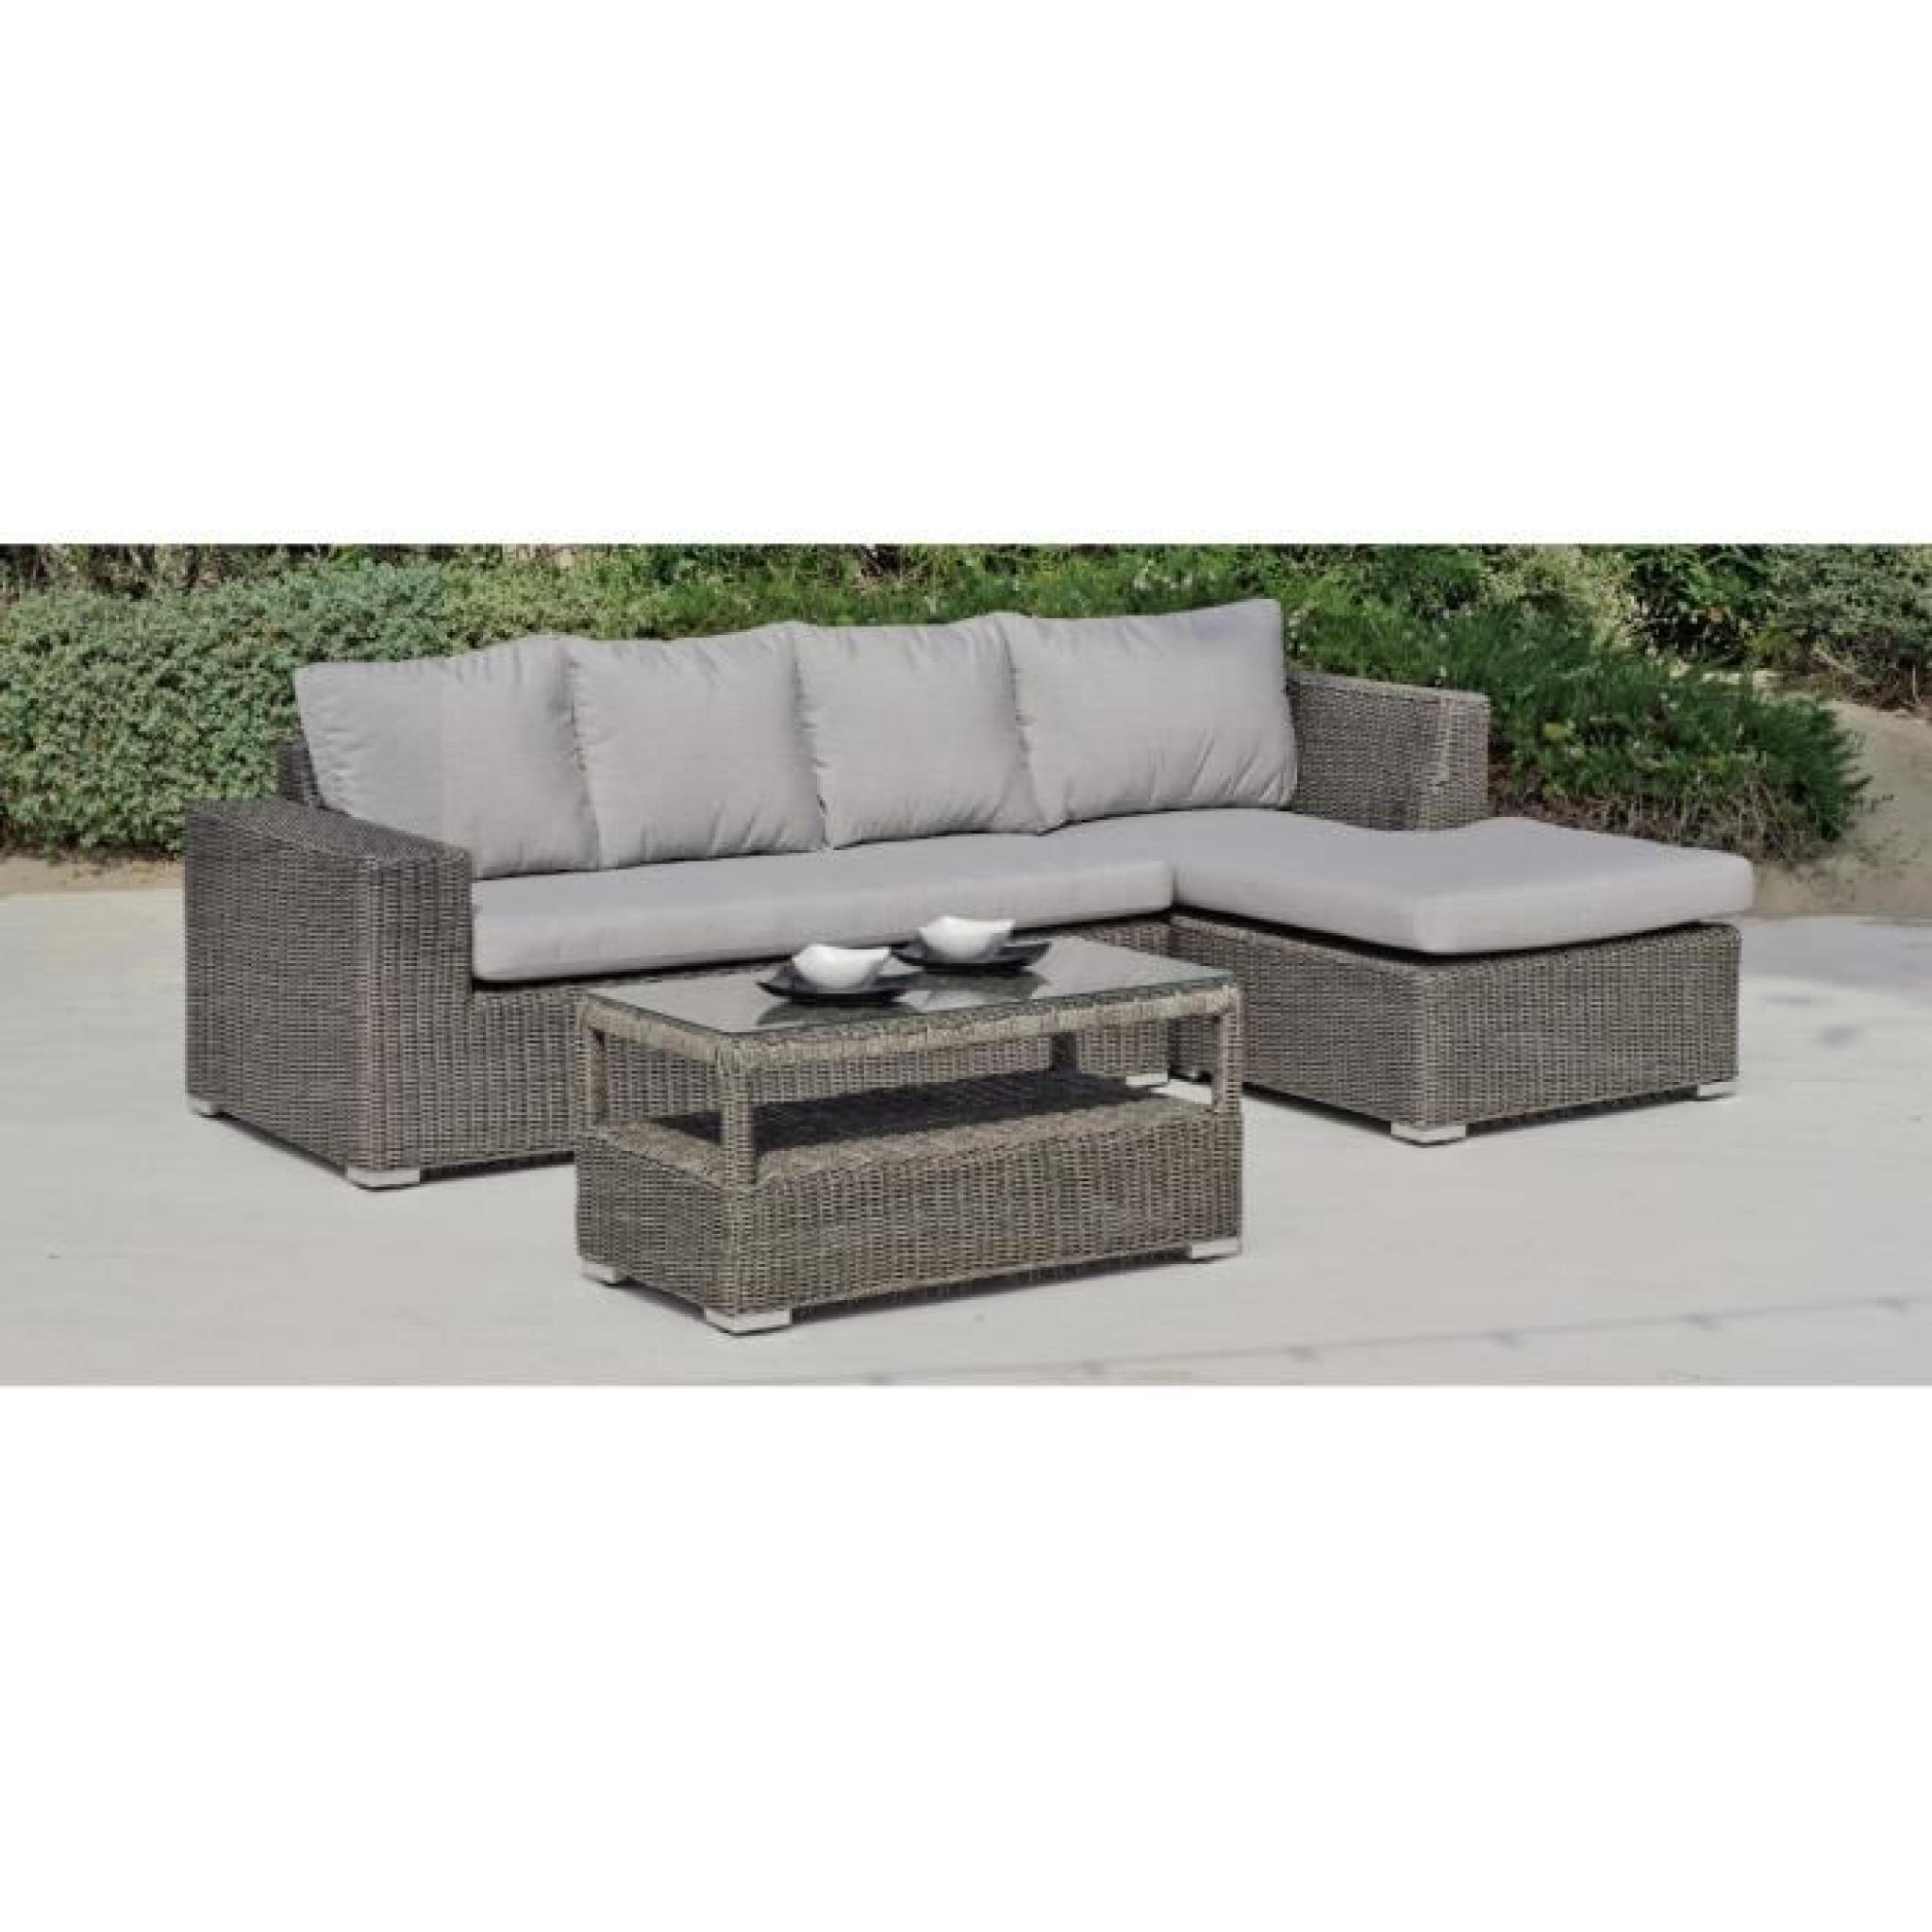 Canapé jardin et table basse gris Toscana